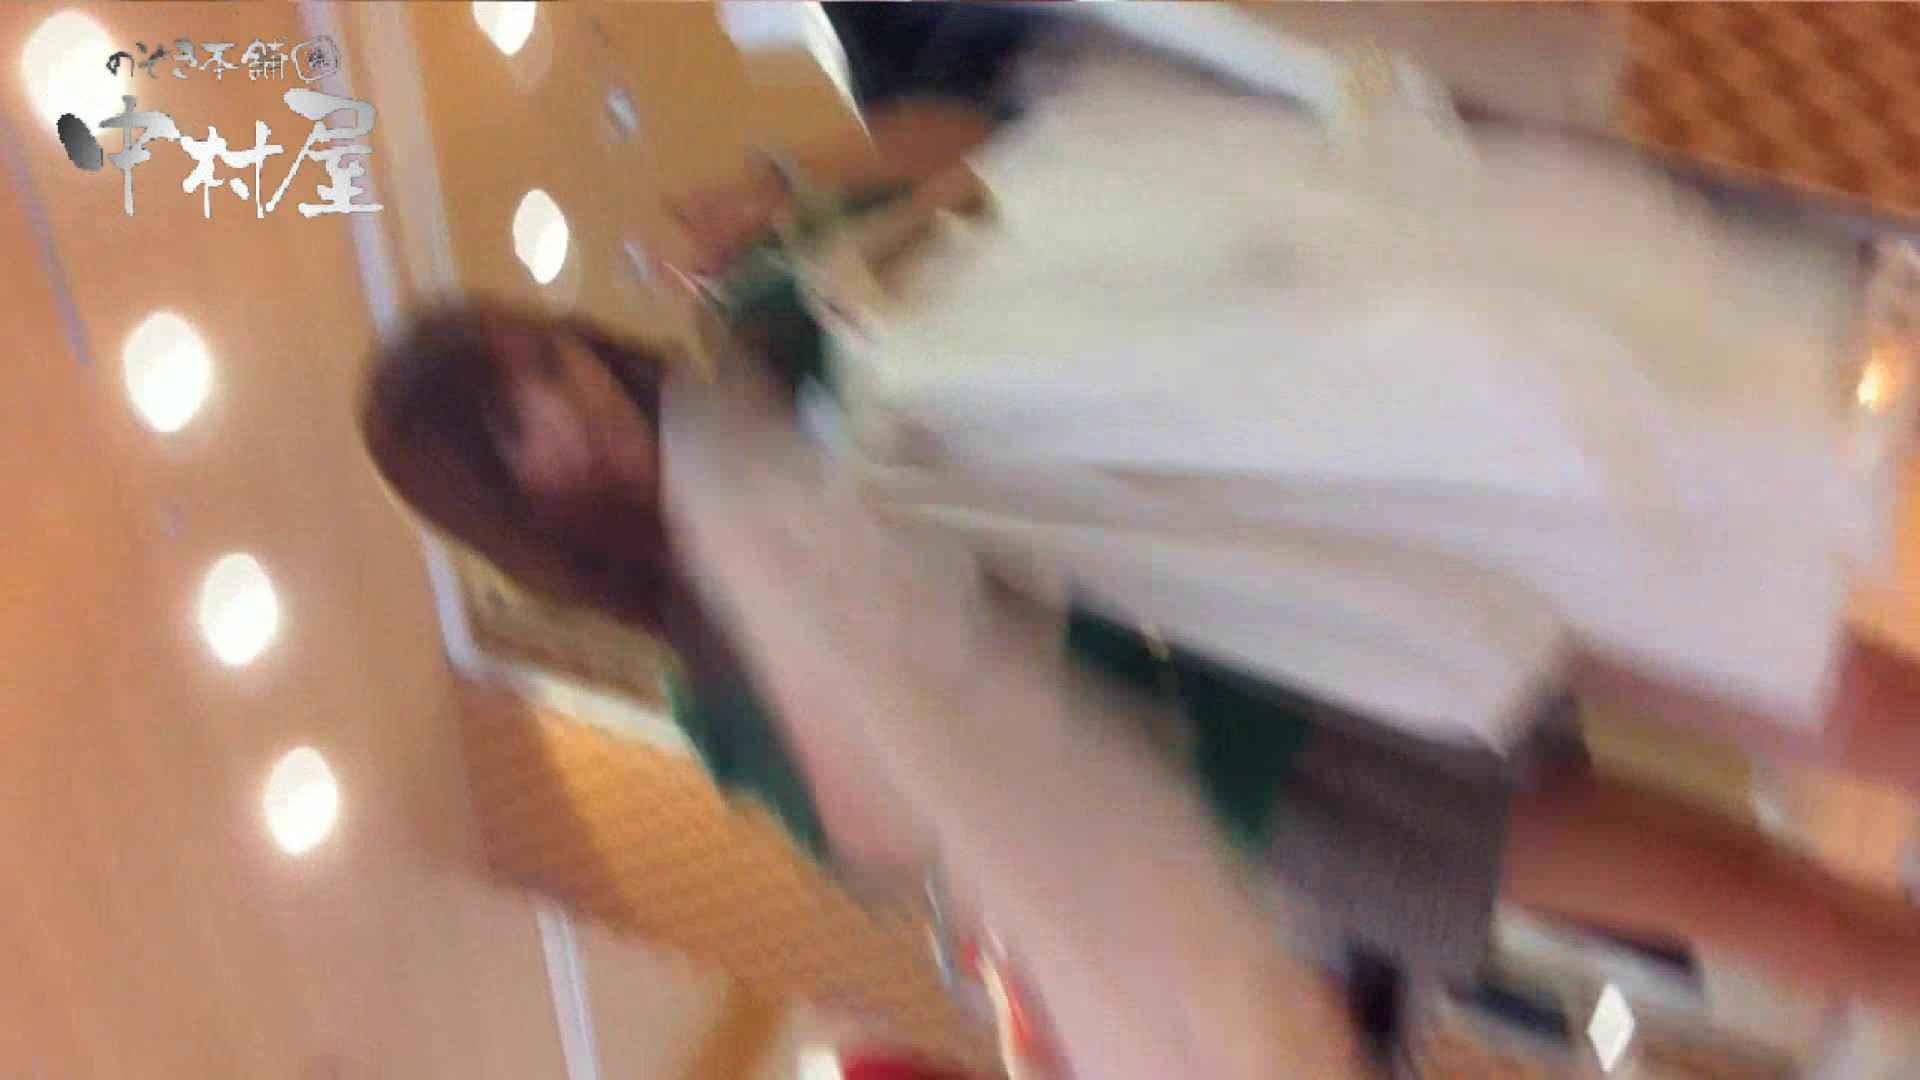 vol.48可愛いカリスマ店員胸チラ&パンチラ アニメ声の店員さん 胸チラ  96Pix 85